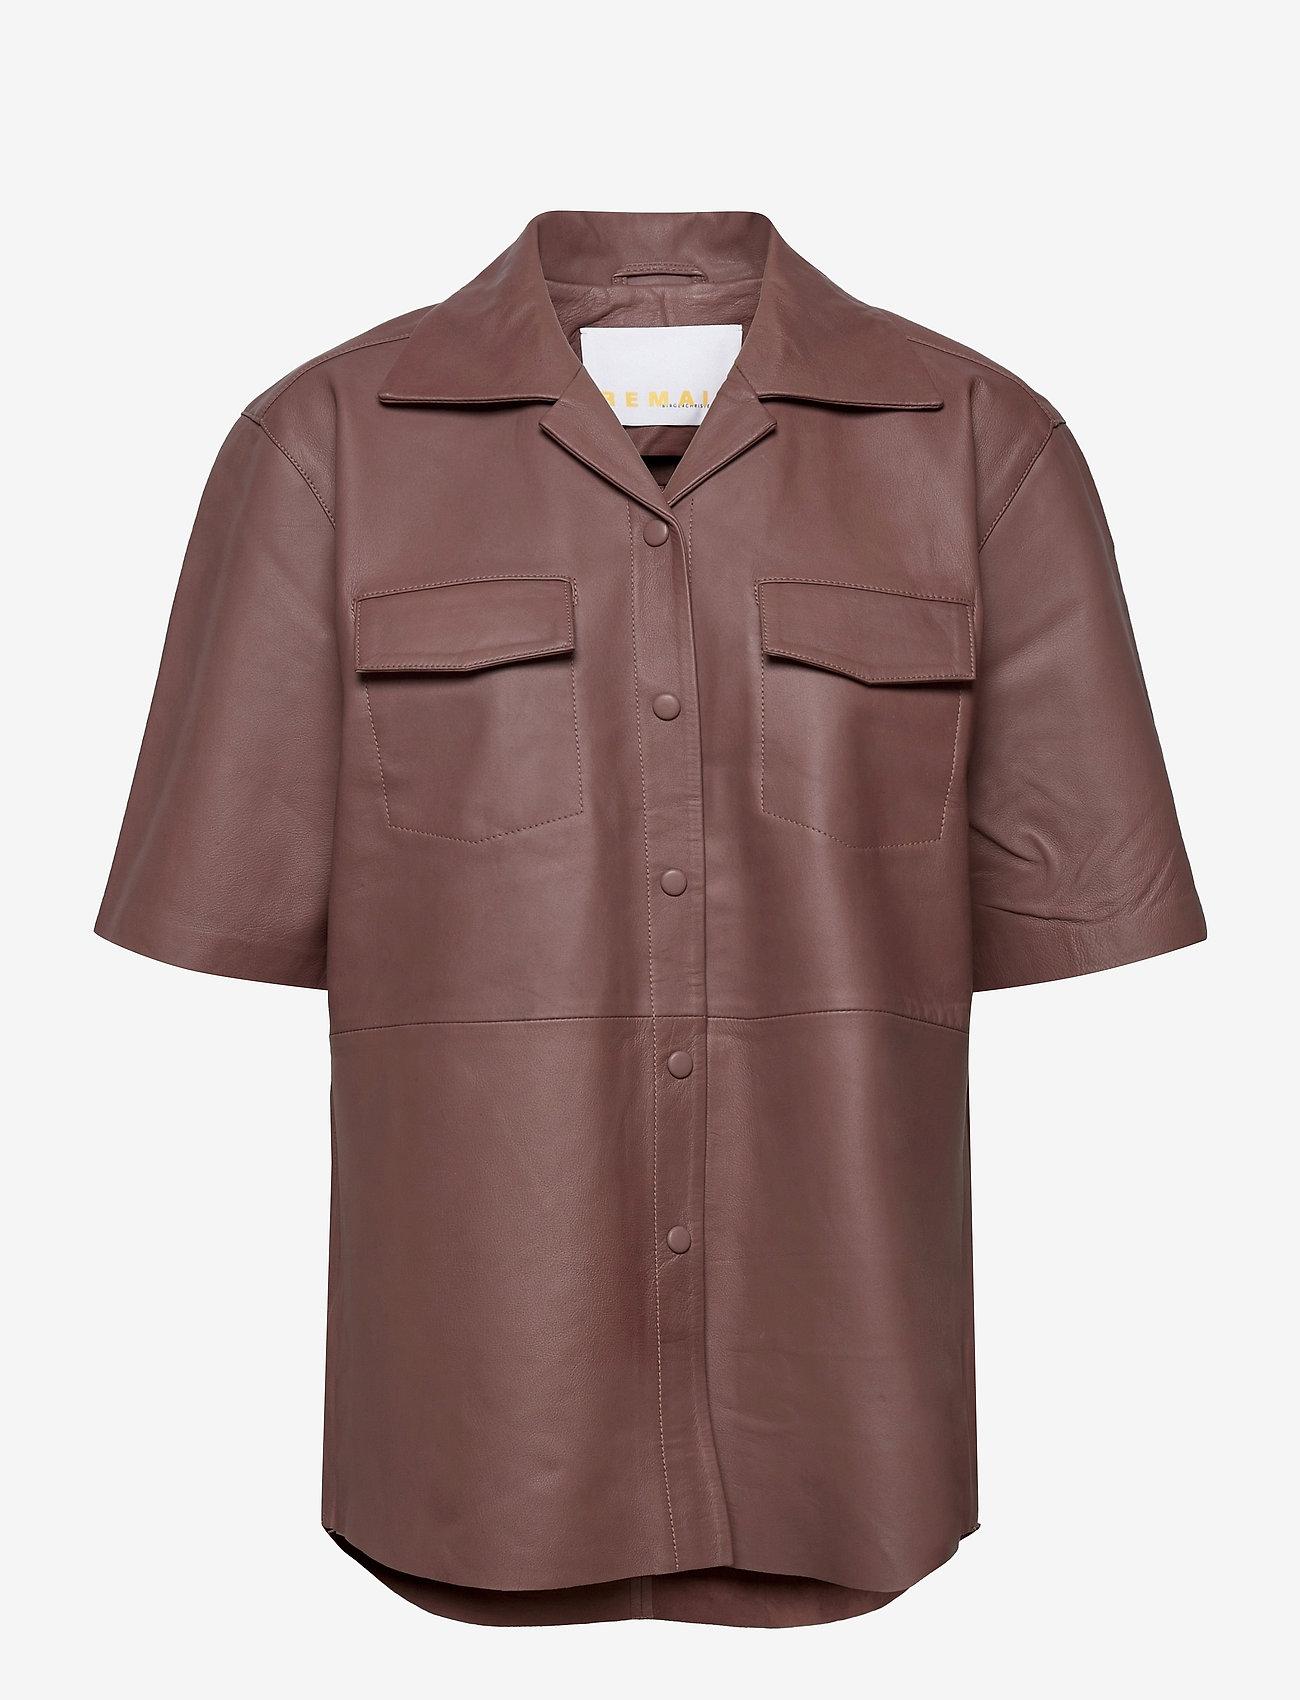 REMAIN Birger Christensen - Jocy Shirt Leather - denimskjorter - fawn - 0